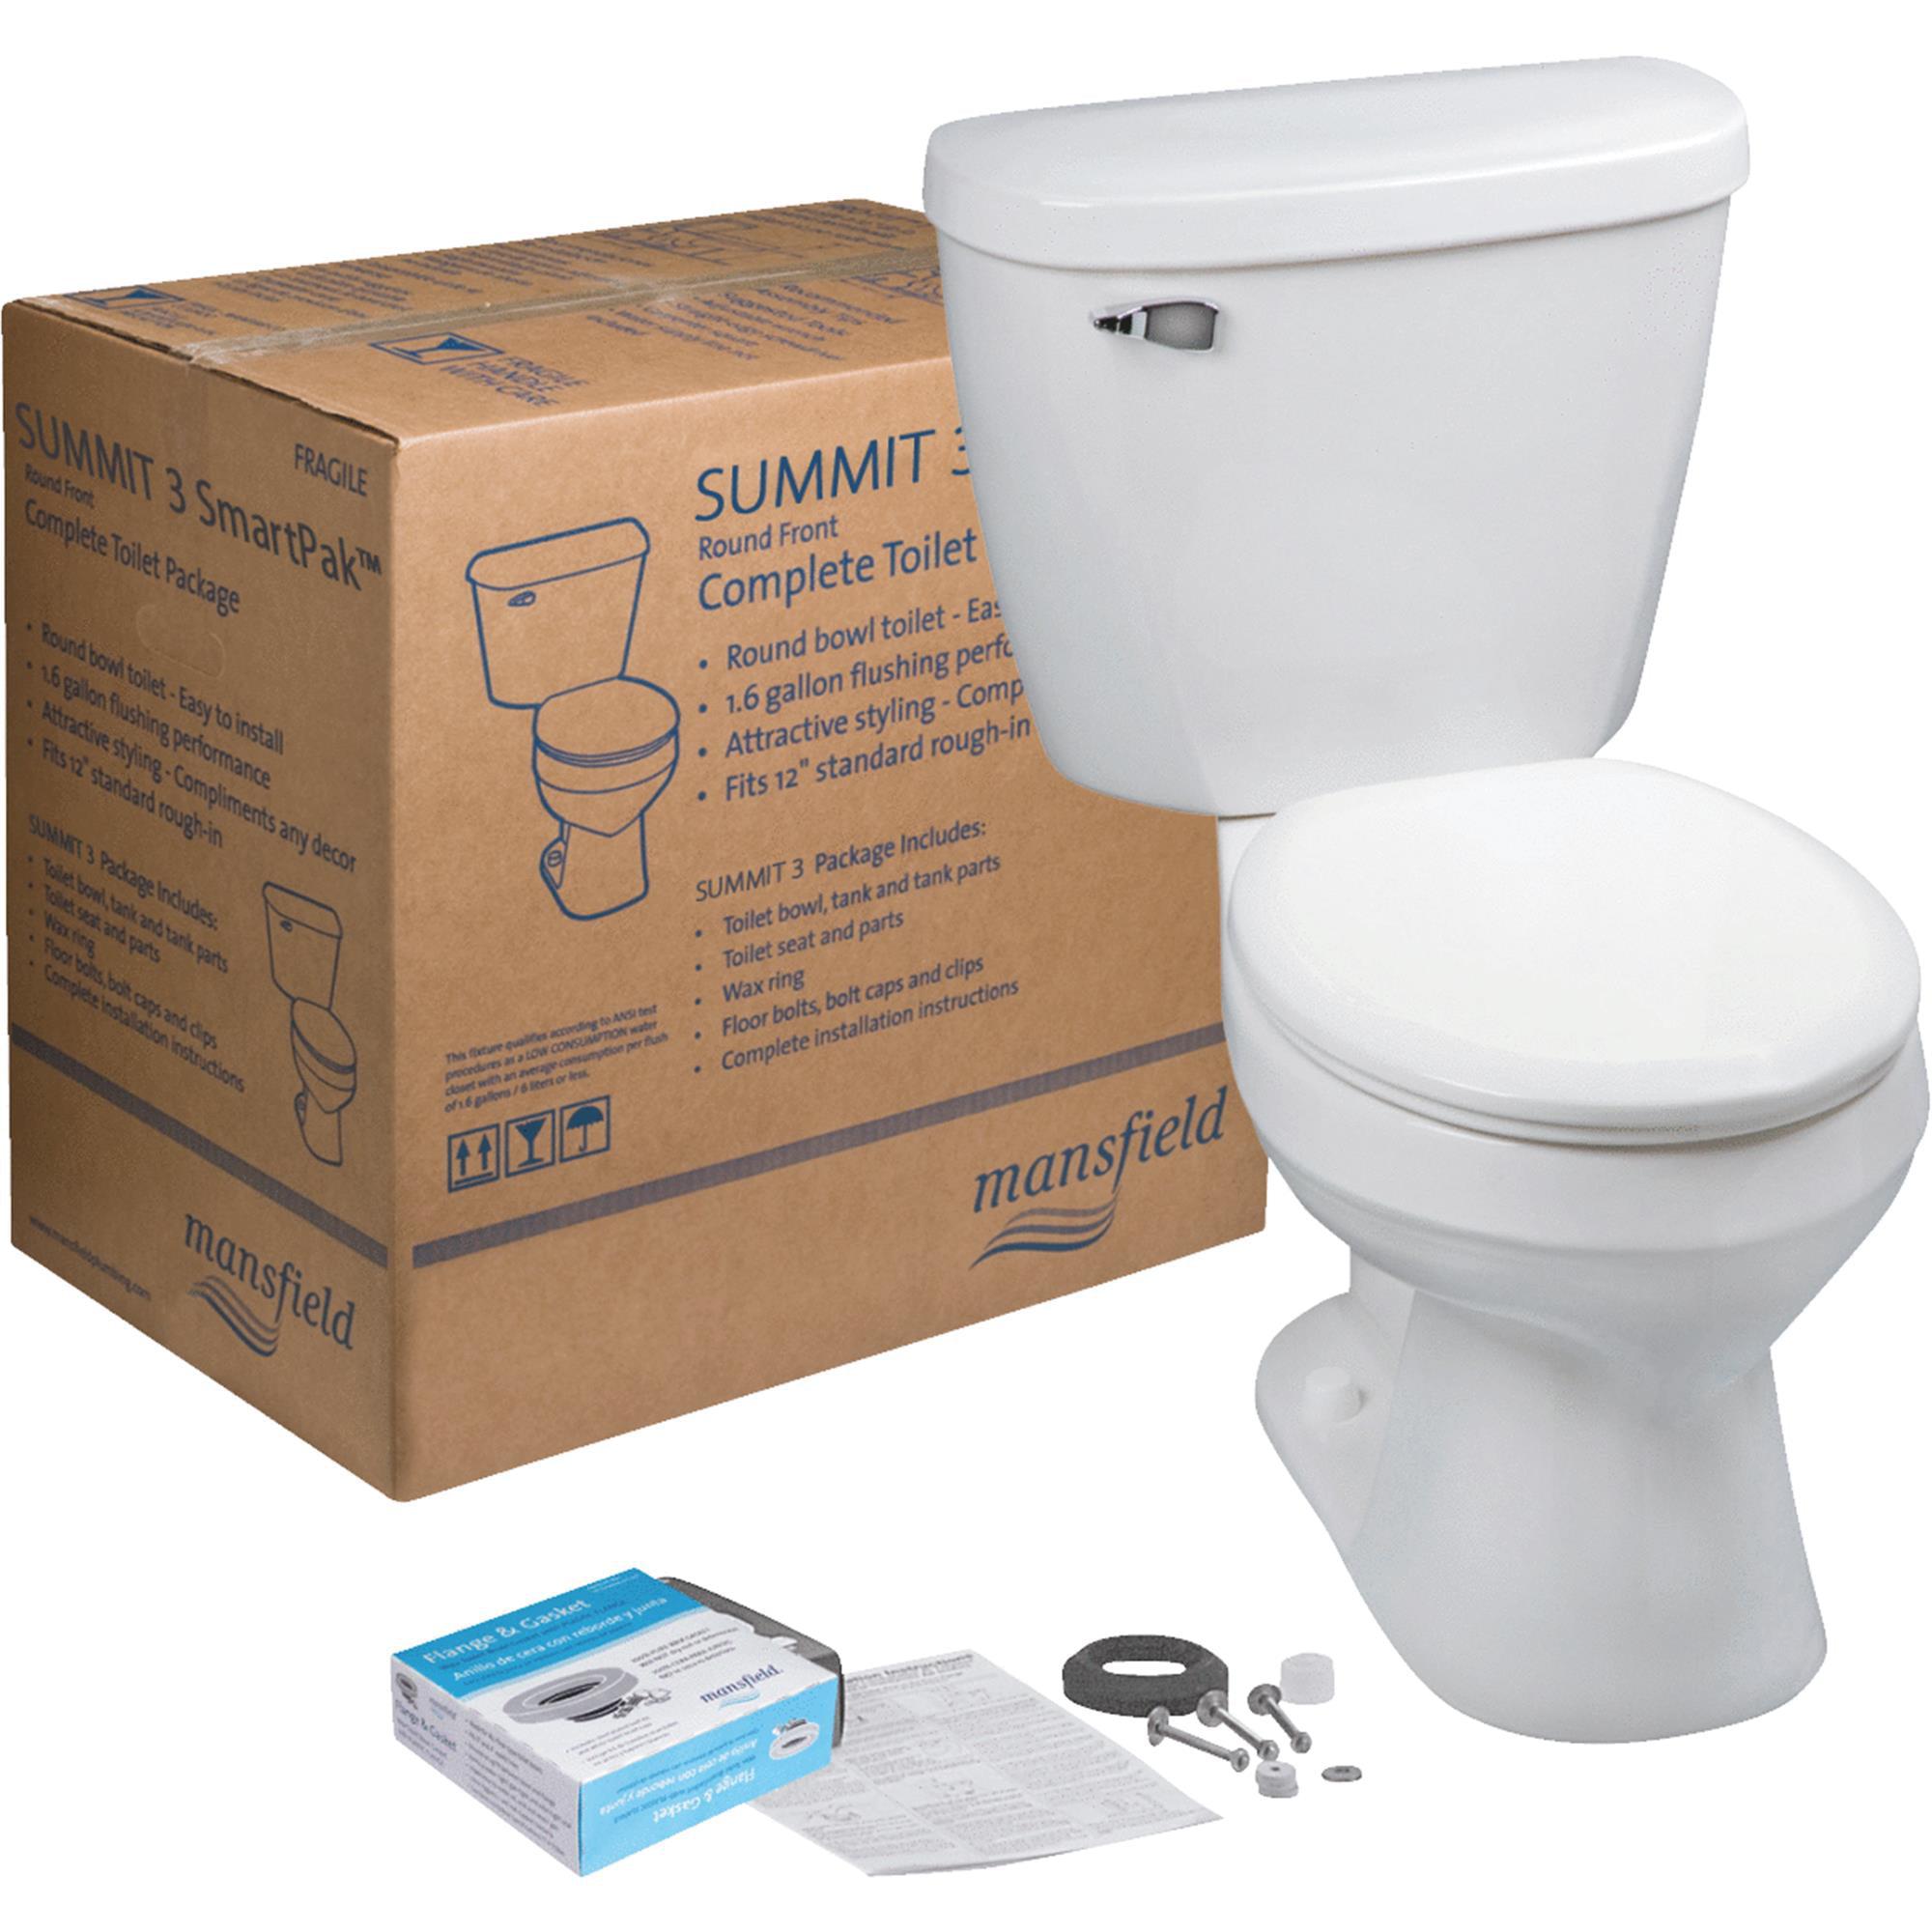 Mansfield Summit SmarkPak Complete Toilet